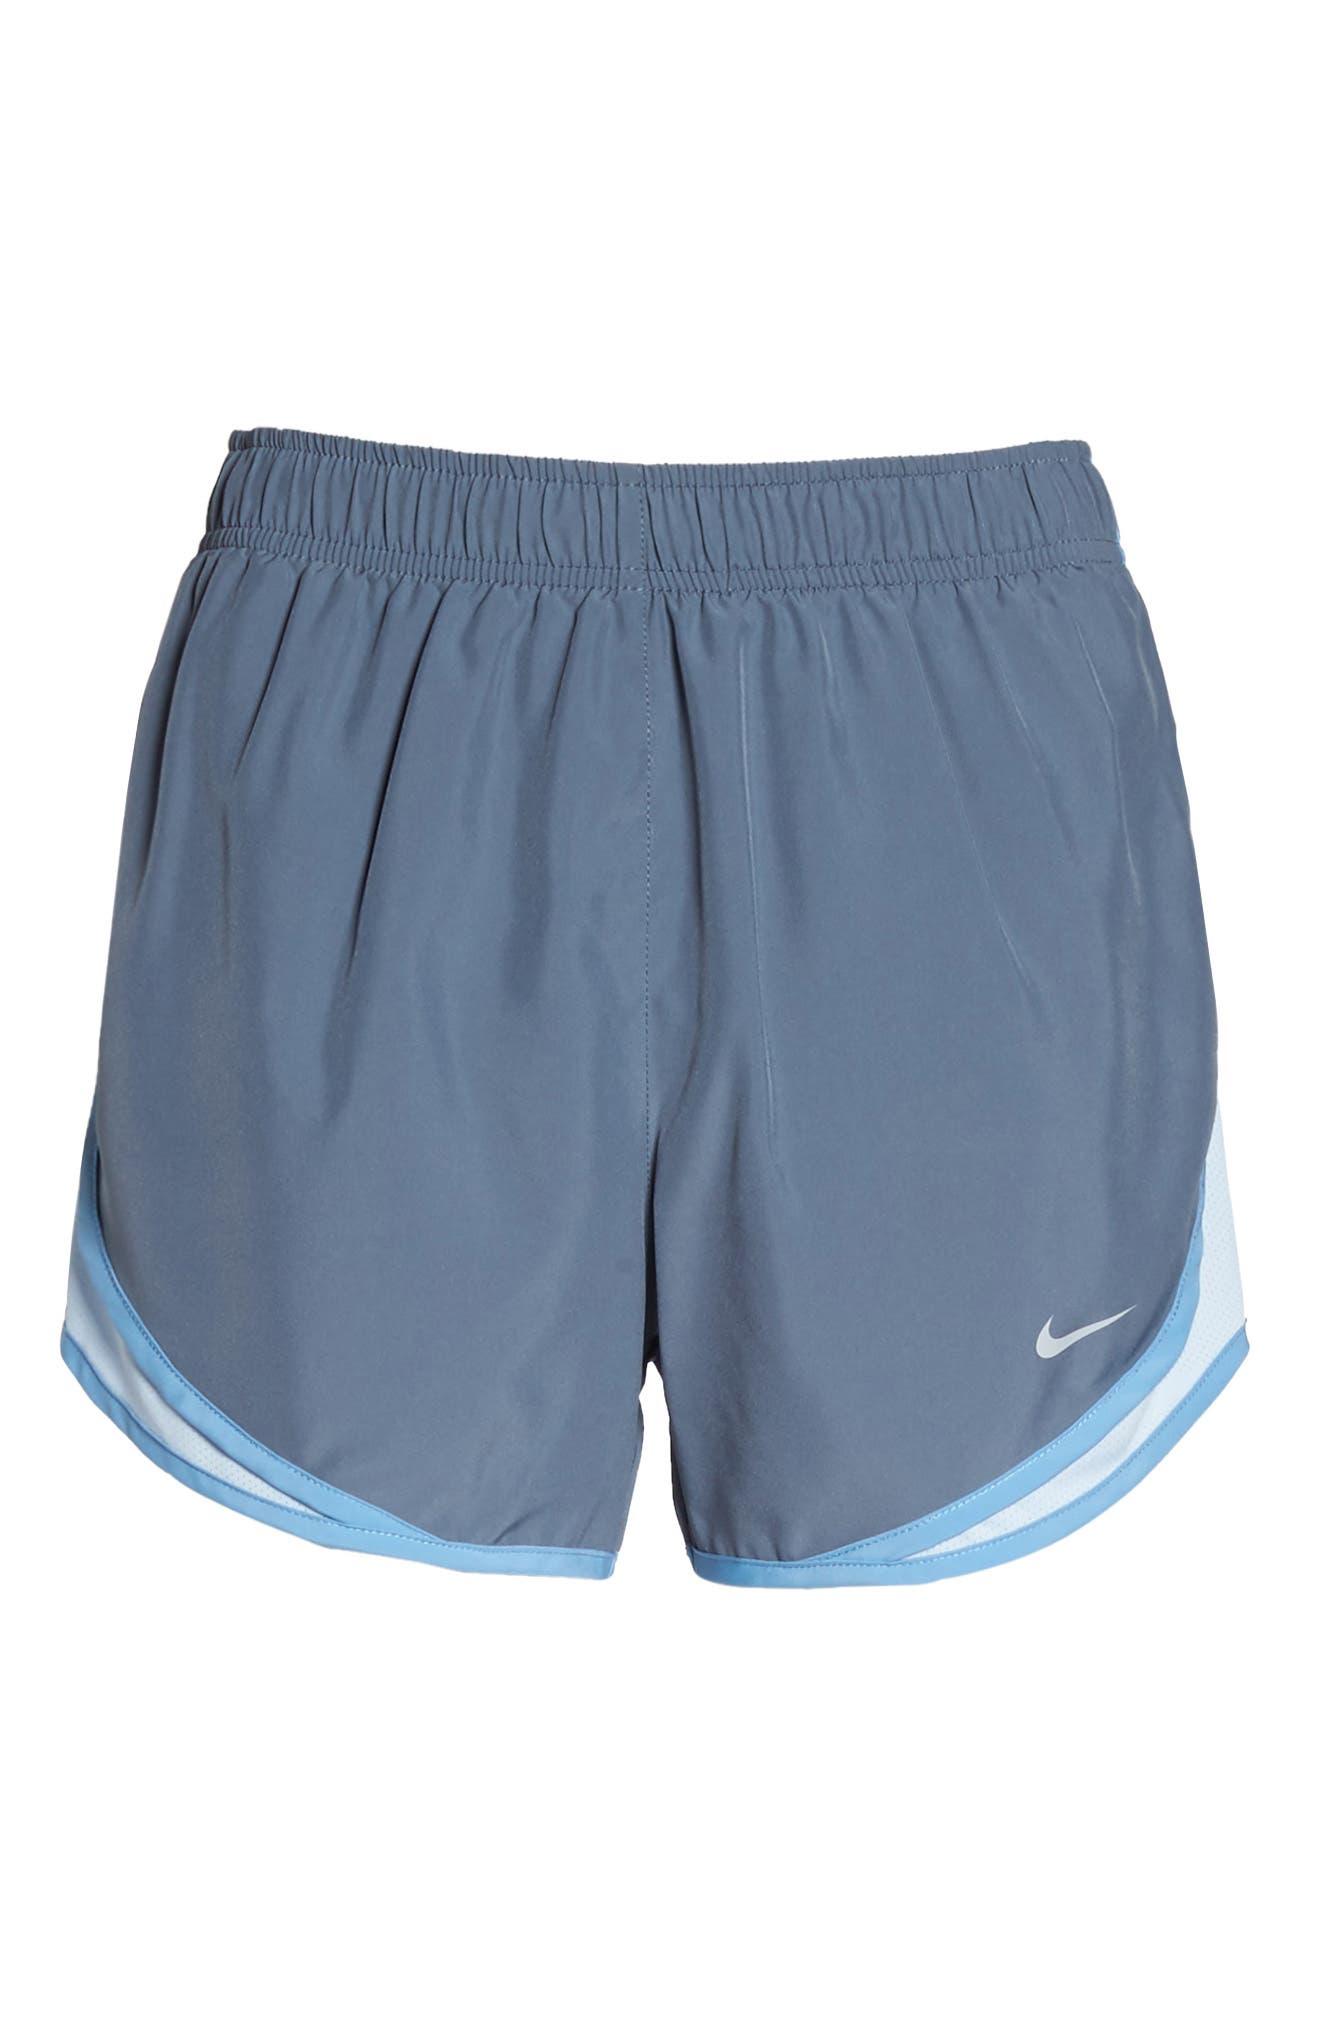 Dry Tempo Running Shorts,                             Alternate thumbnail 451, color,